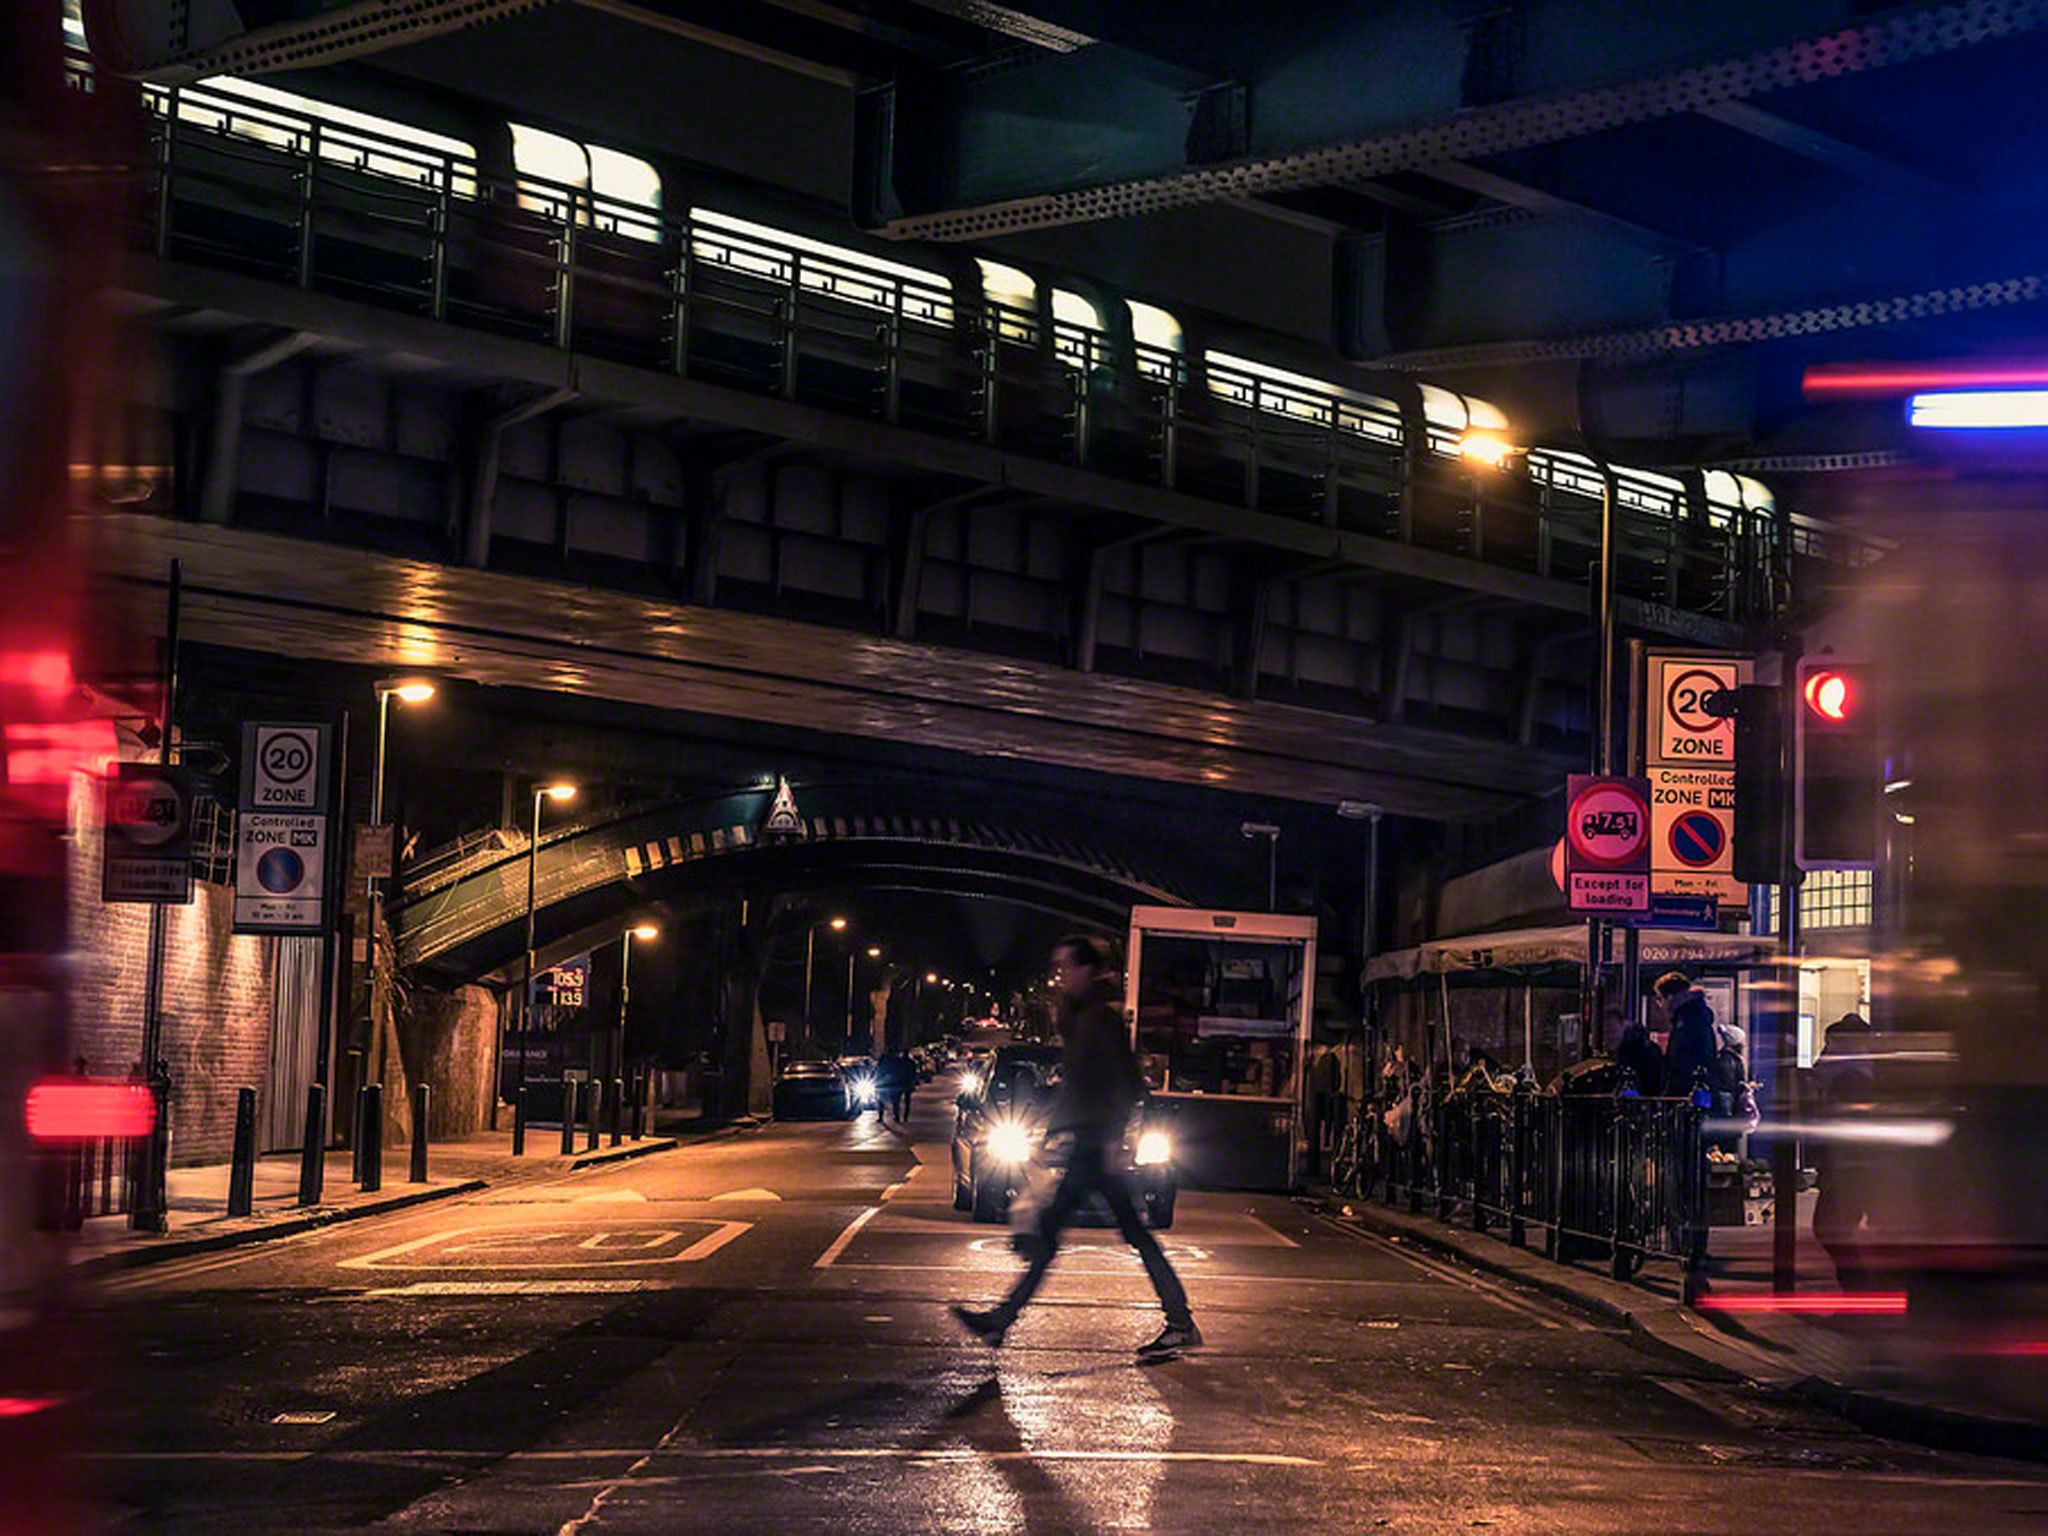 Train going over a London bridge